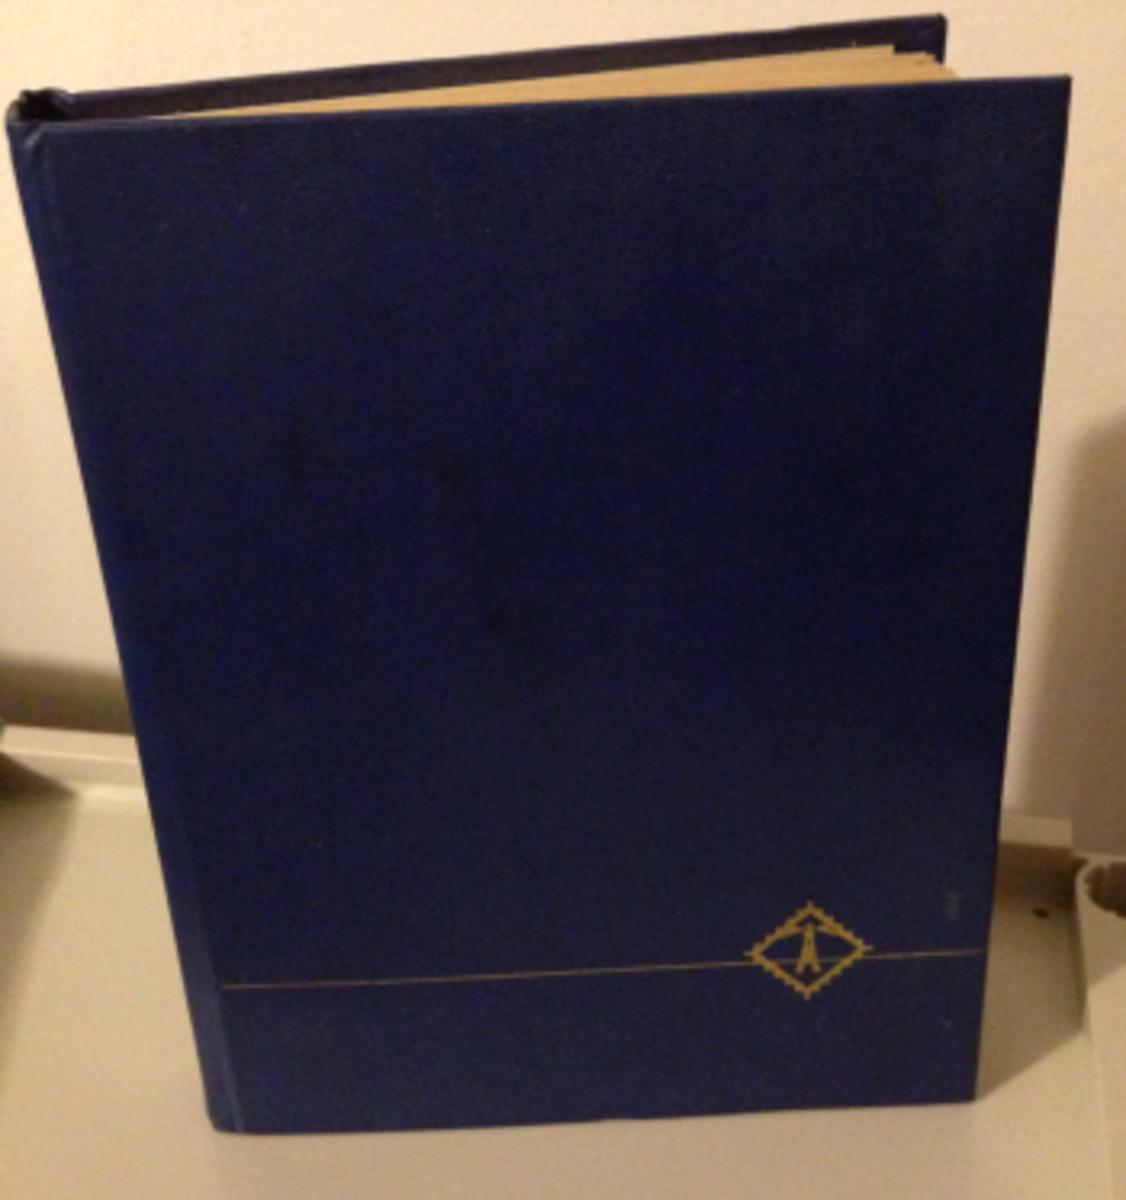 "A regular size stockbook, about 8"" x 11""."